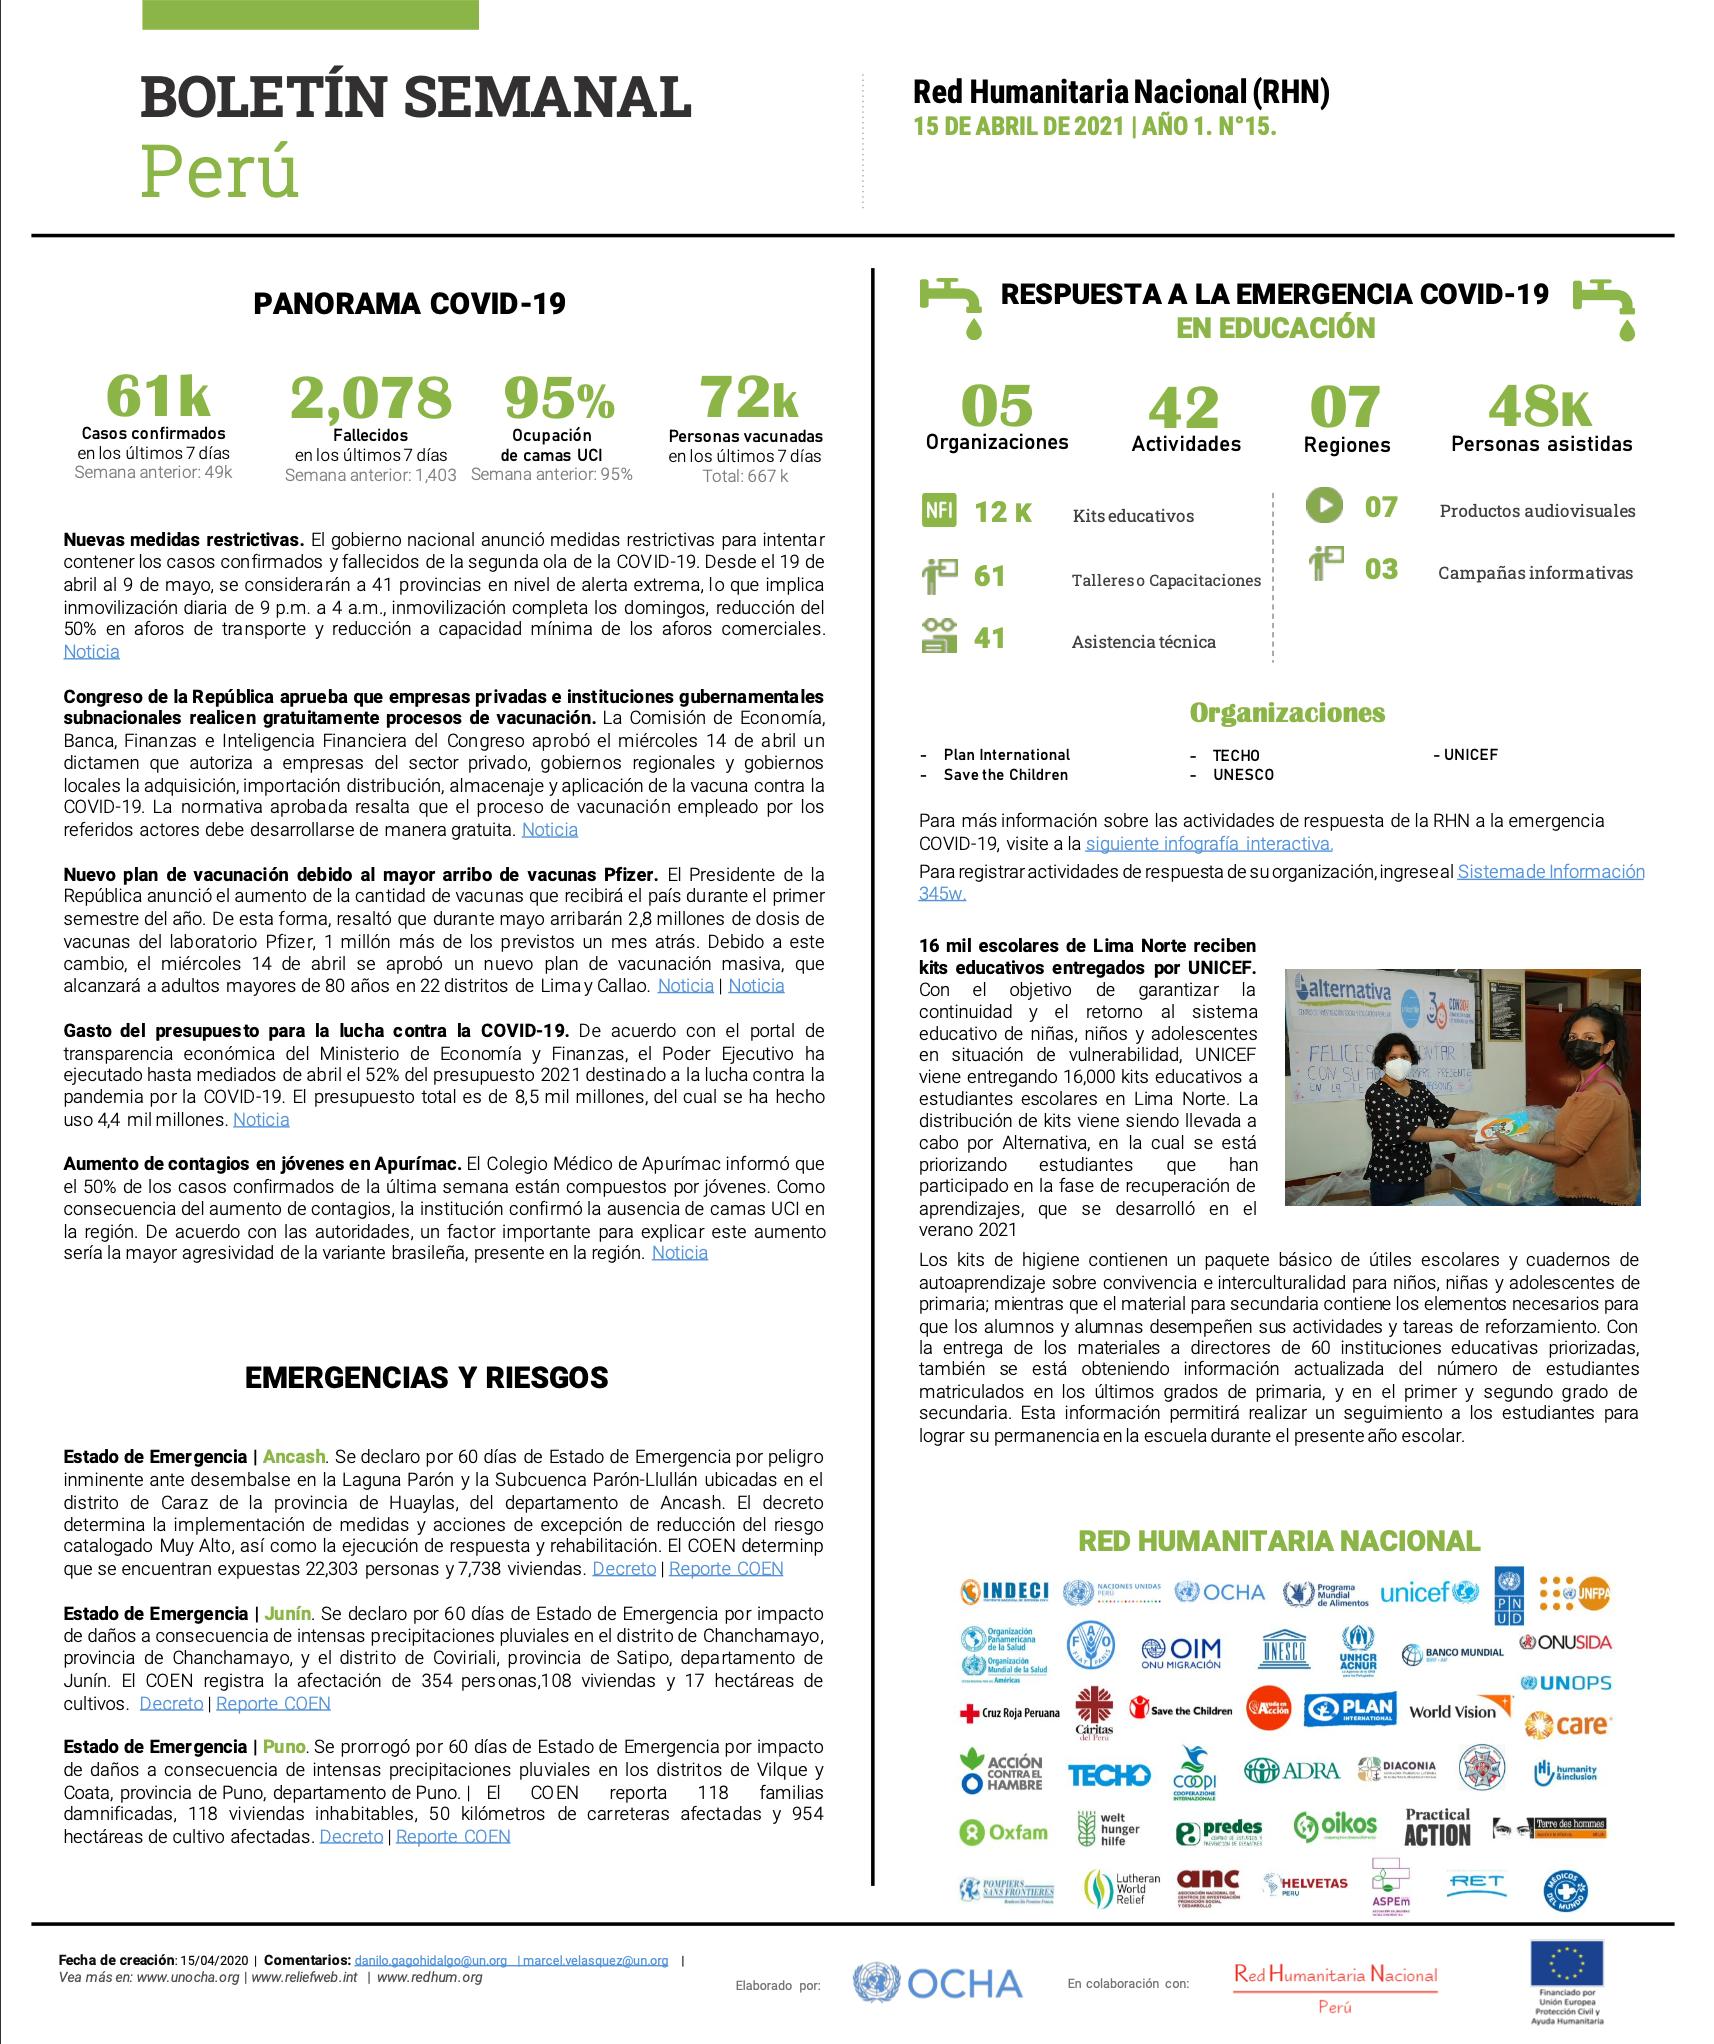 Boletín Semanal | Red Humanitaria Nacional | Abril 2021